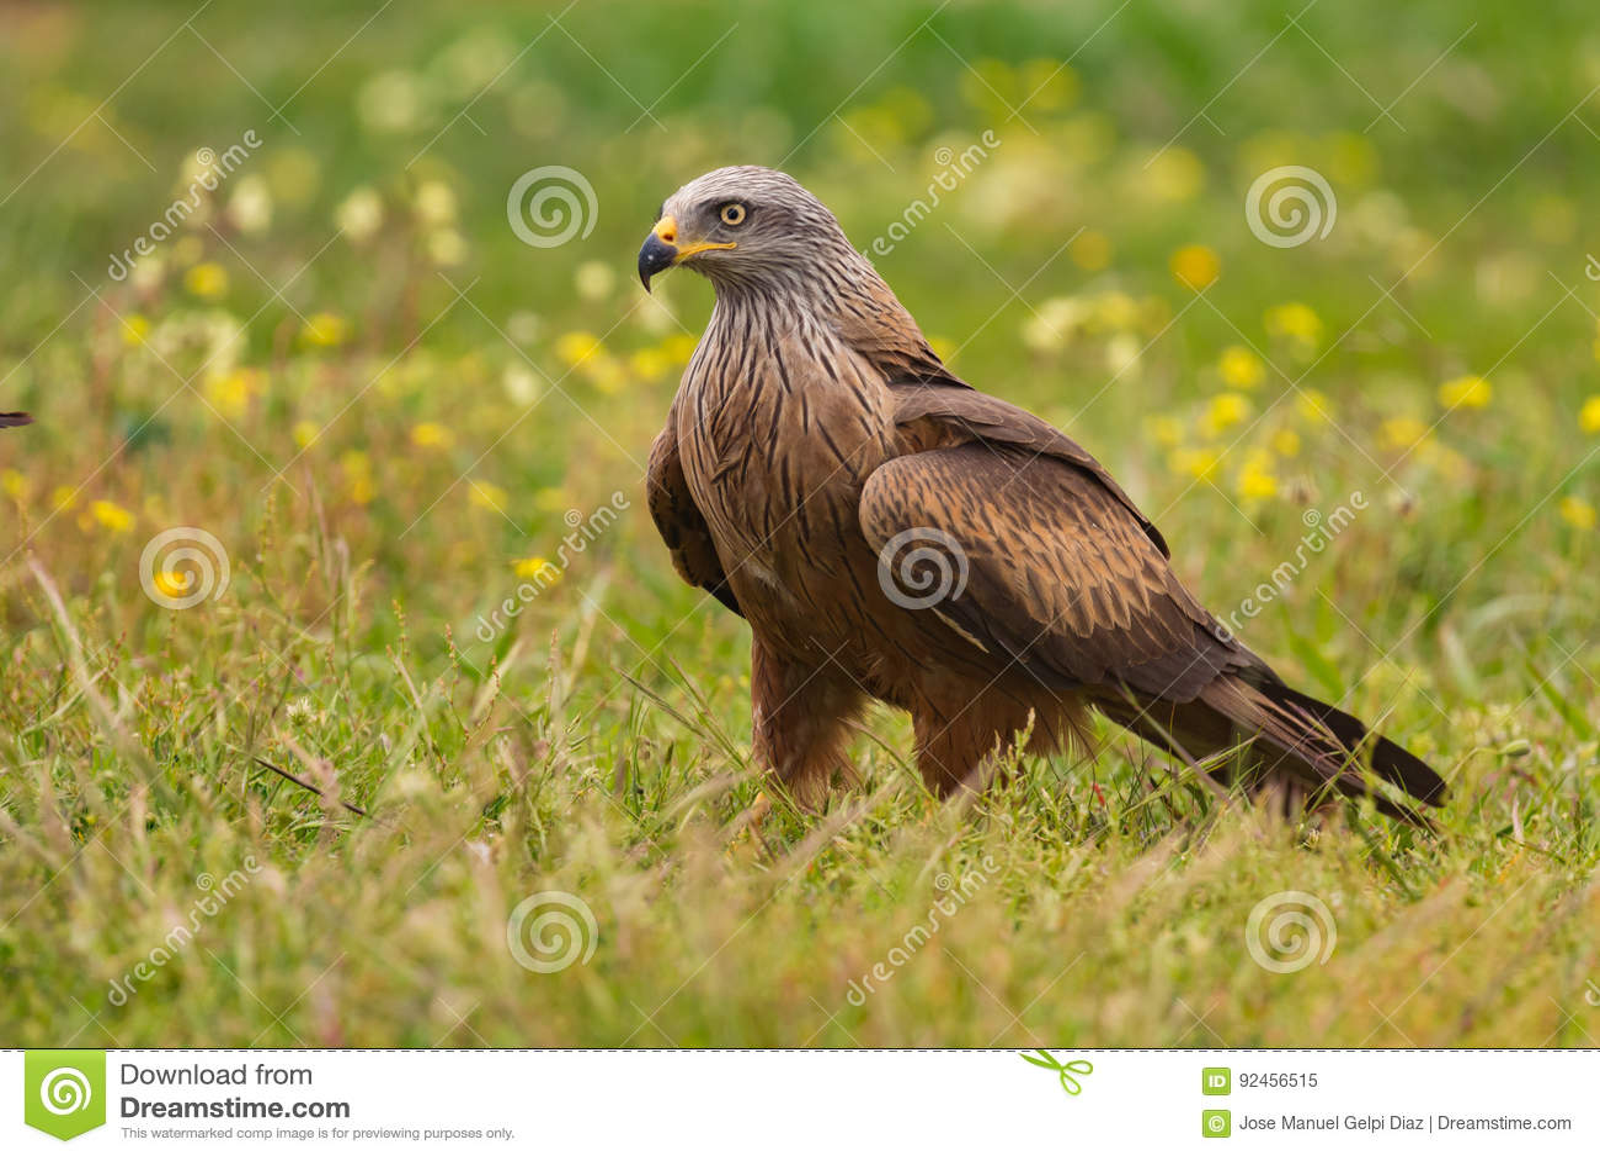 Papagaio preto adulto